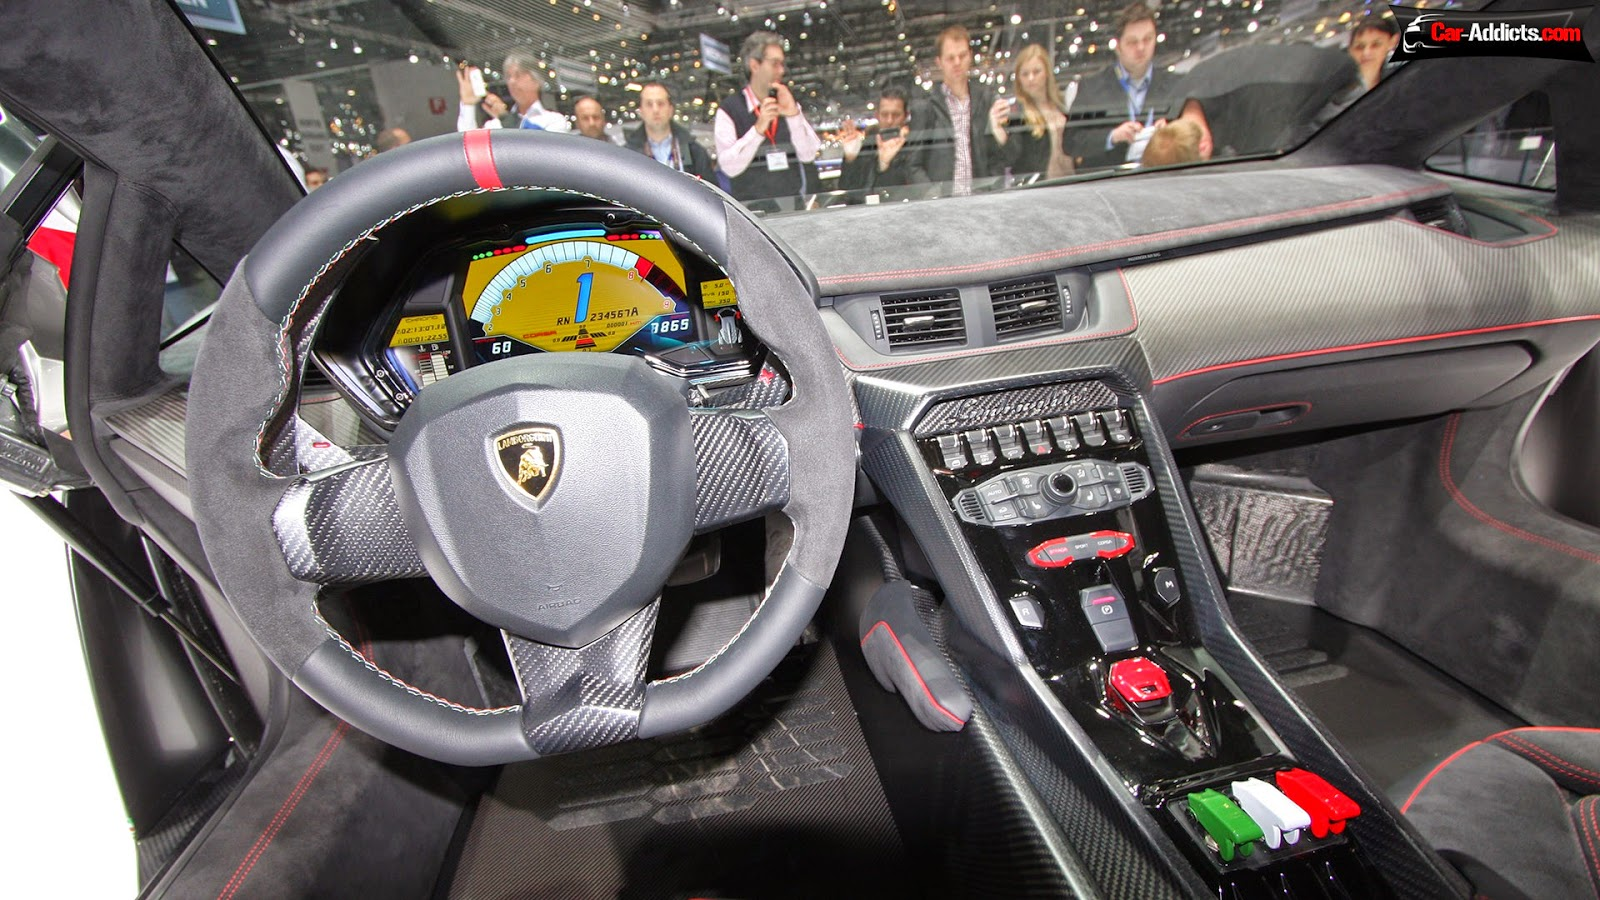 Lamborghini Veneno Detail Interior And Exterior Lamborghini Veneno Wallpapers